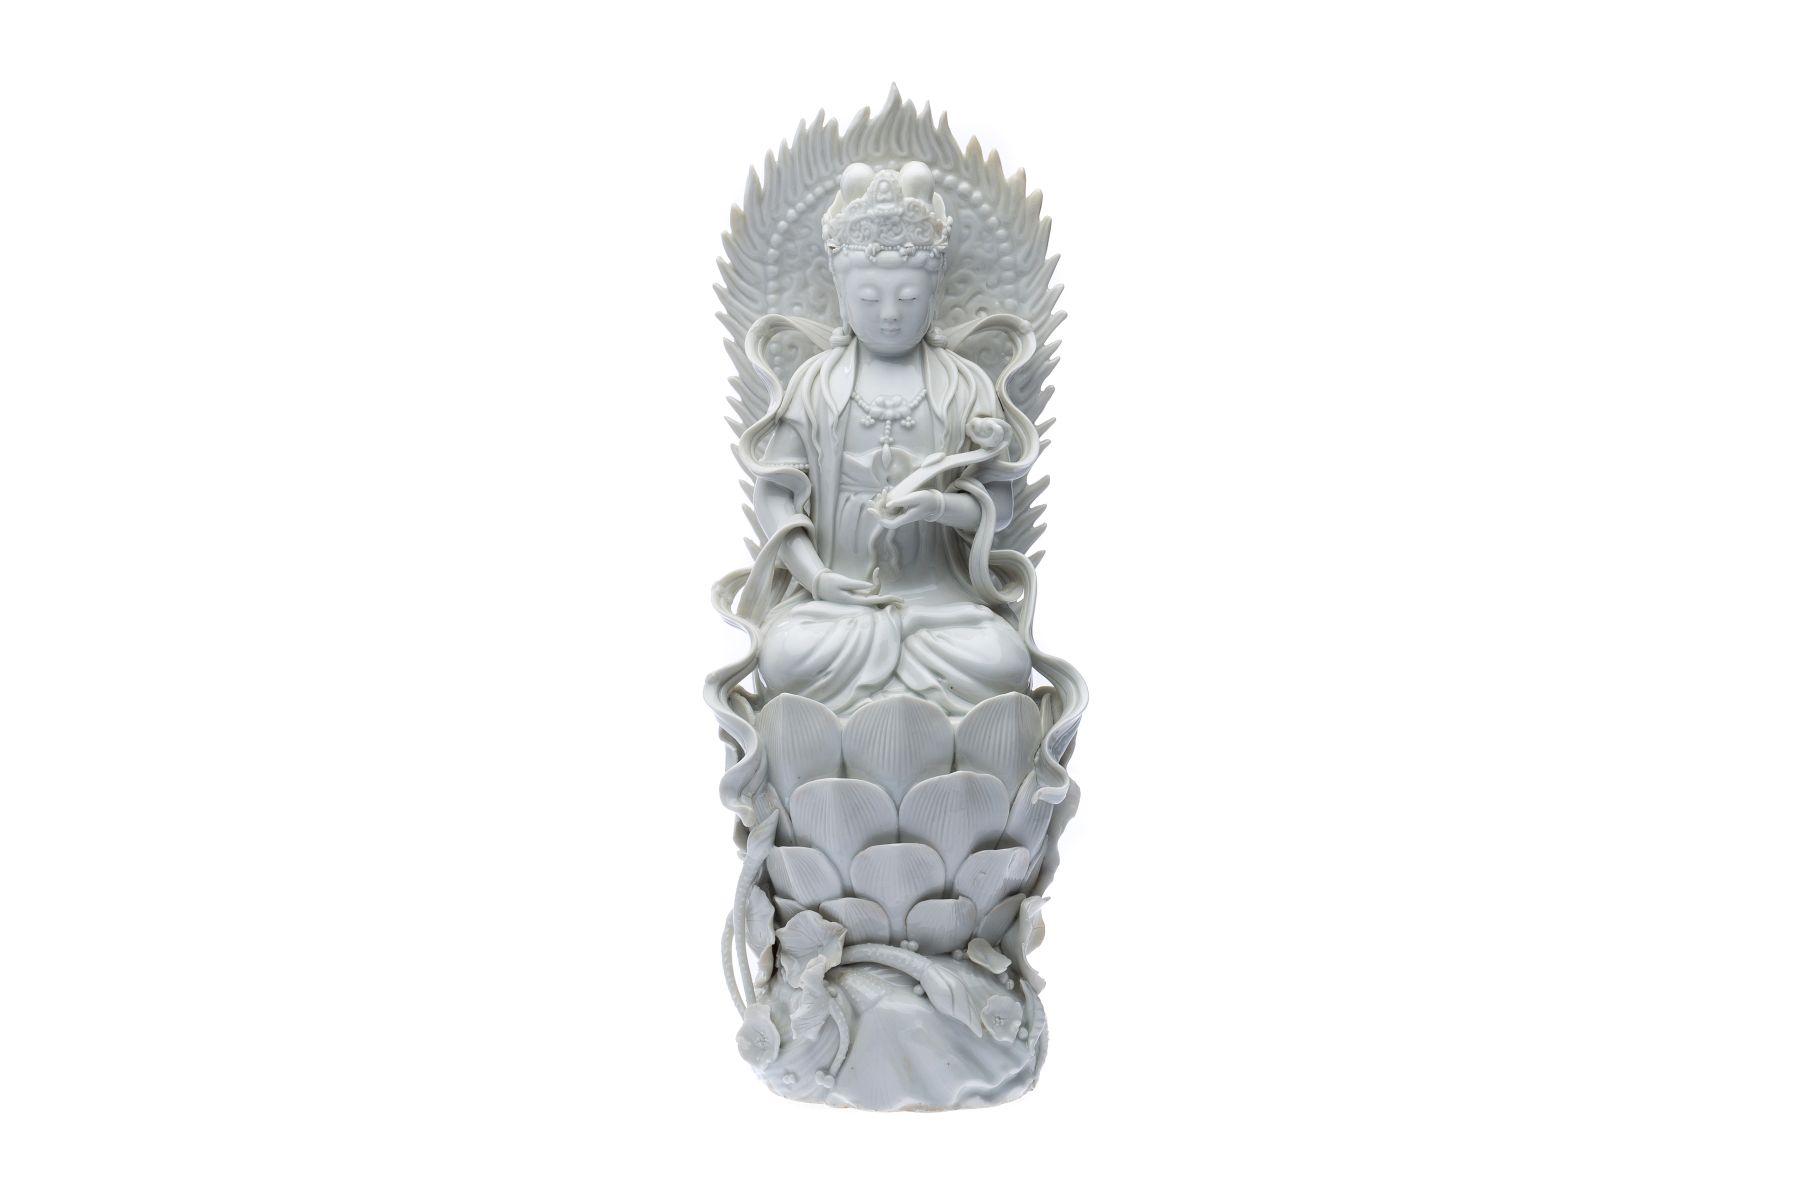 "#194 Blanc de Chine ""Goddess Guanyin"" Dehua porcelain figurine   Blanc de Chine"" Göttin Guanyin"" Figur aus Dehua Porzellan Image"